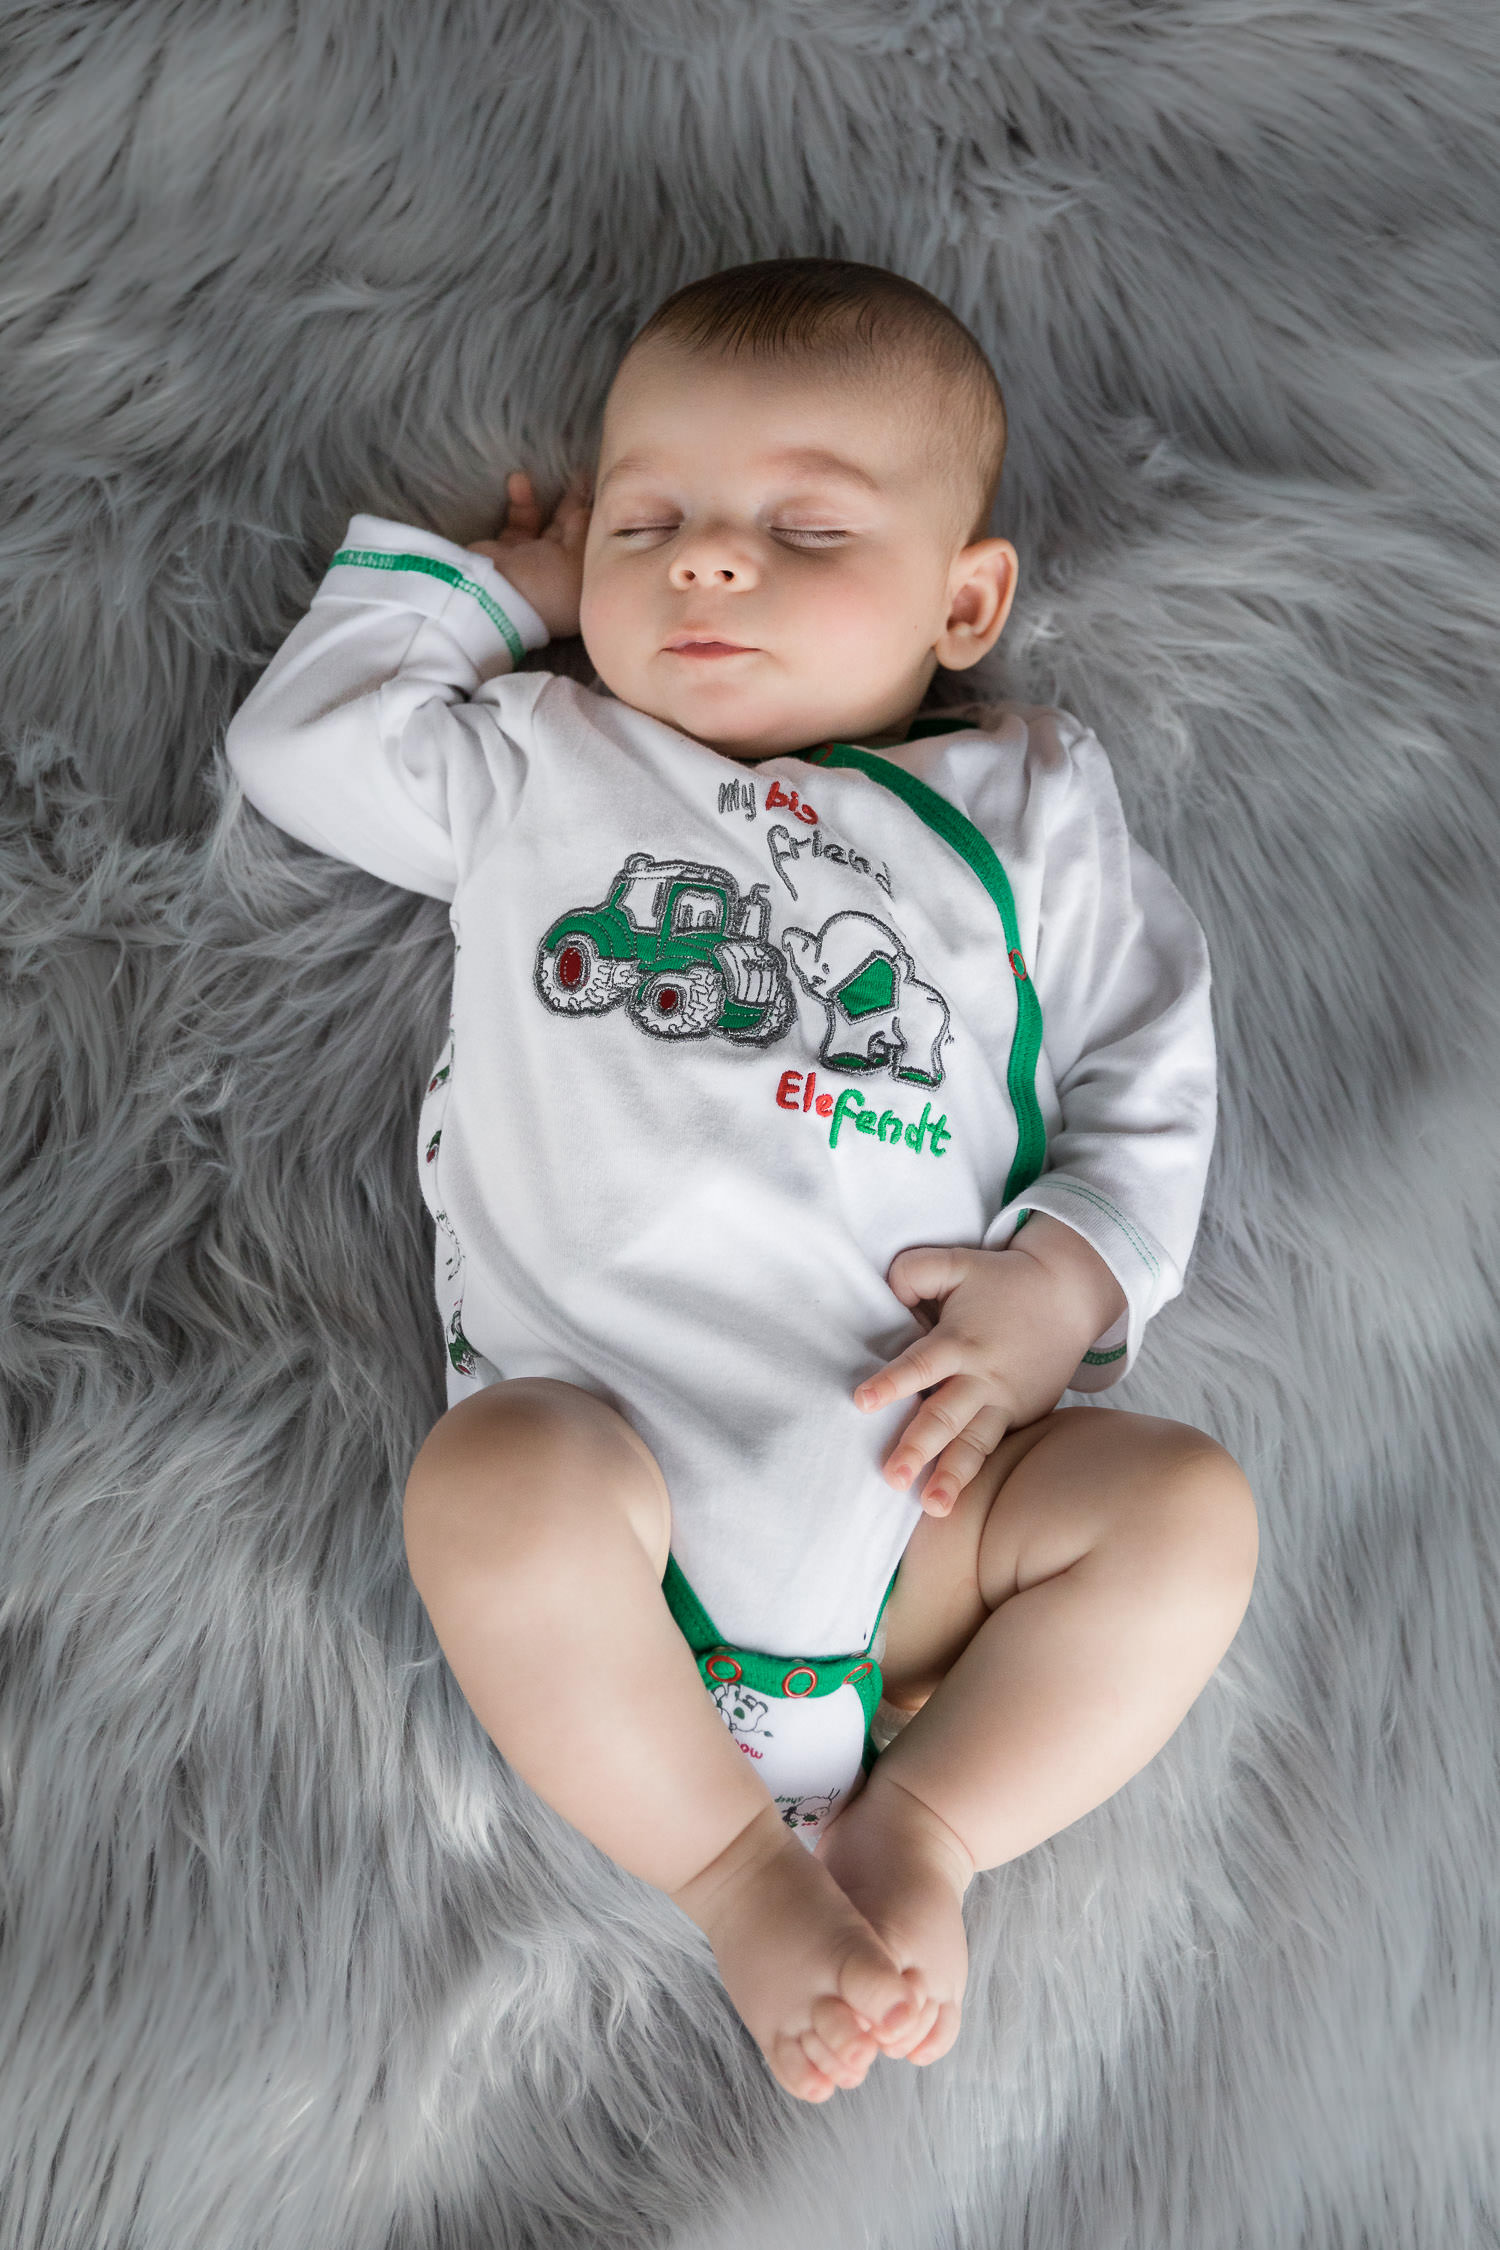 Babyfotografie, Homestory, Andrea Schenke Photography, Fotograf Wittlich